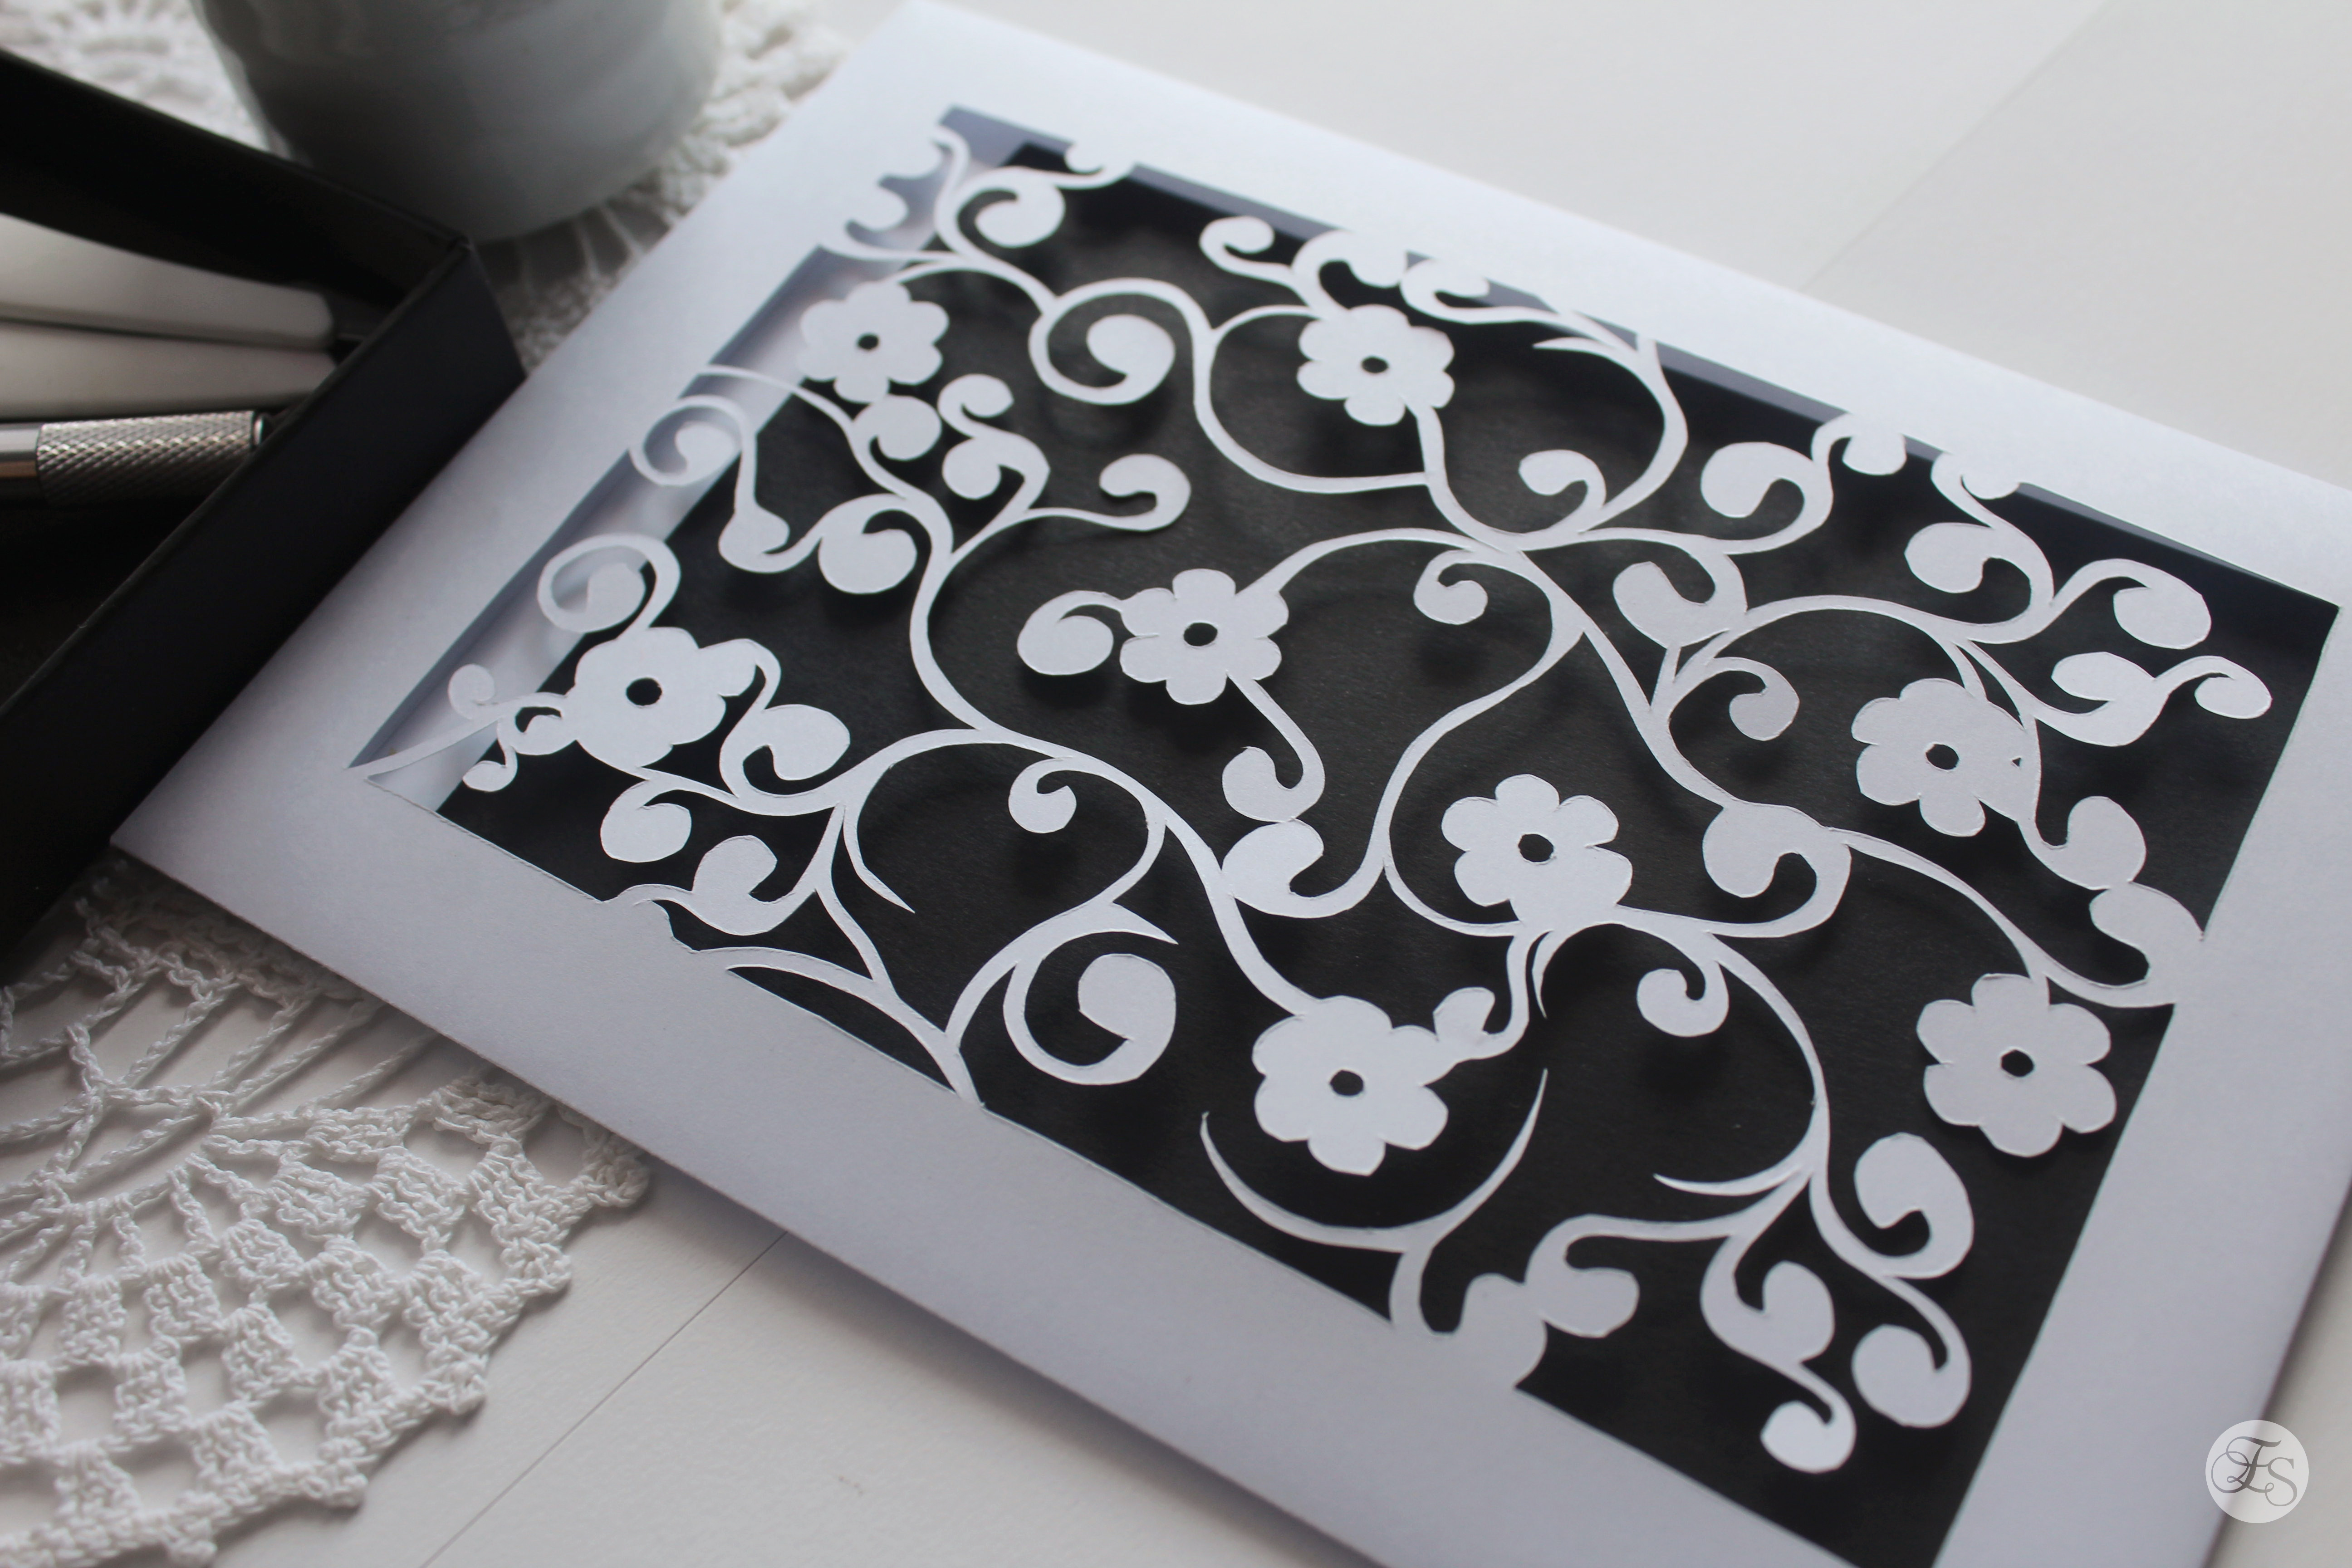 photo regarding Free Printable Paper Cutting Templates identify Paper slicing Eversea